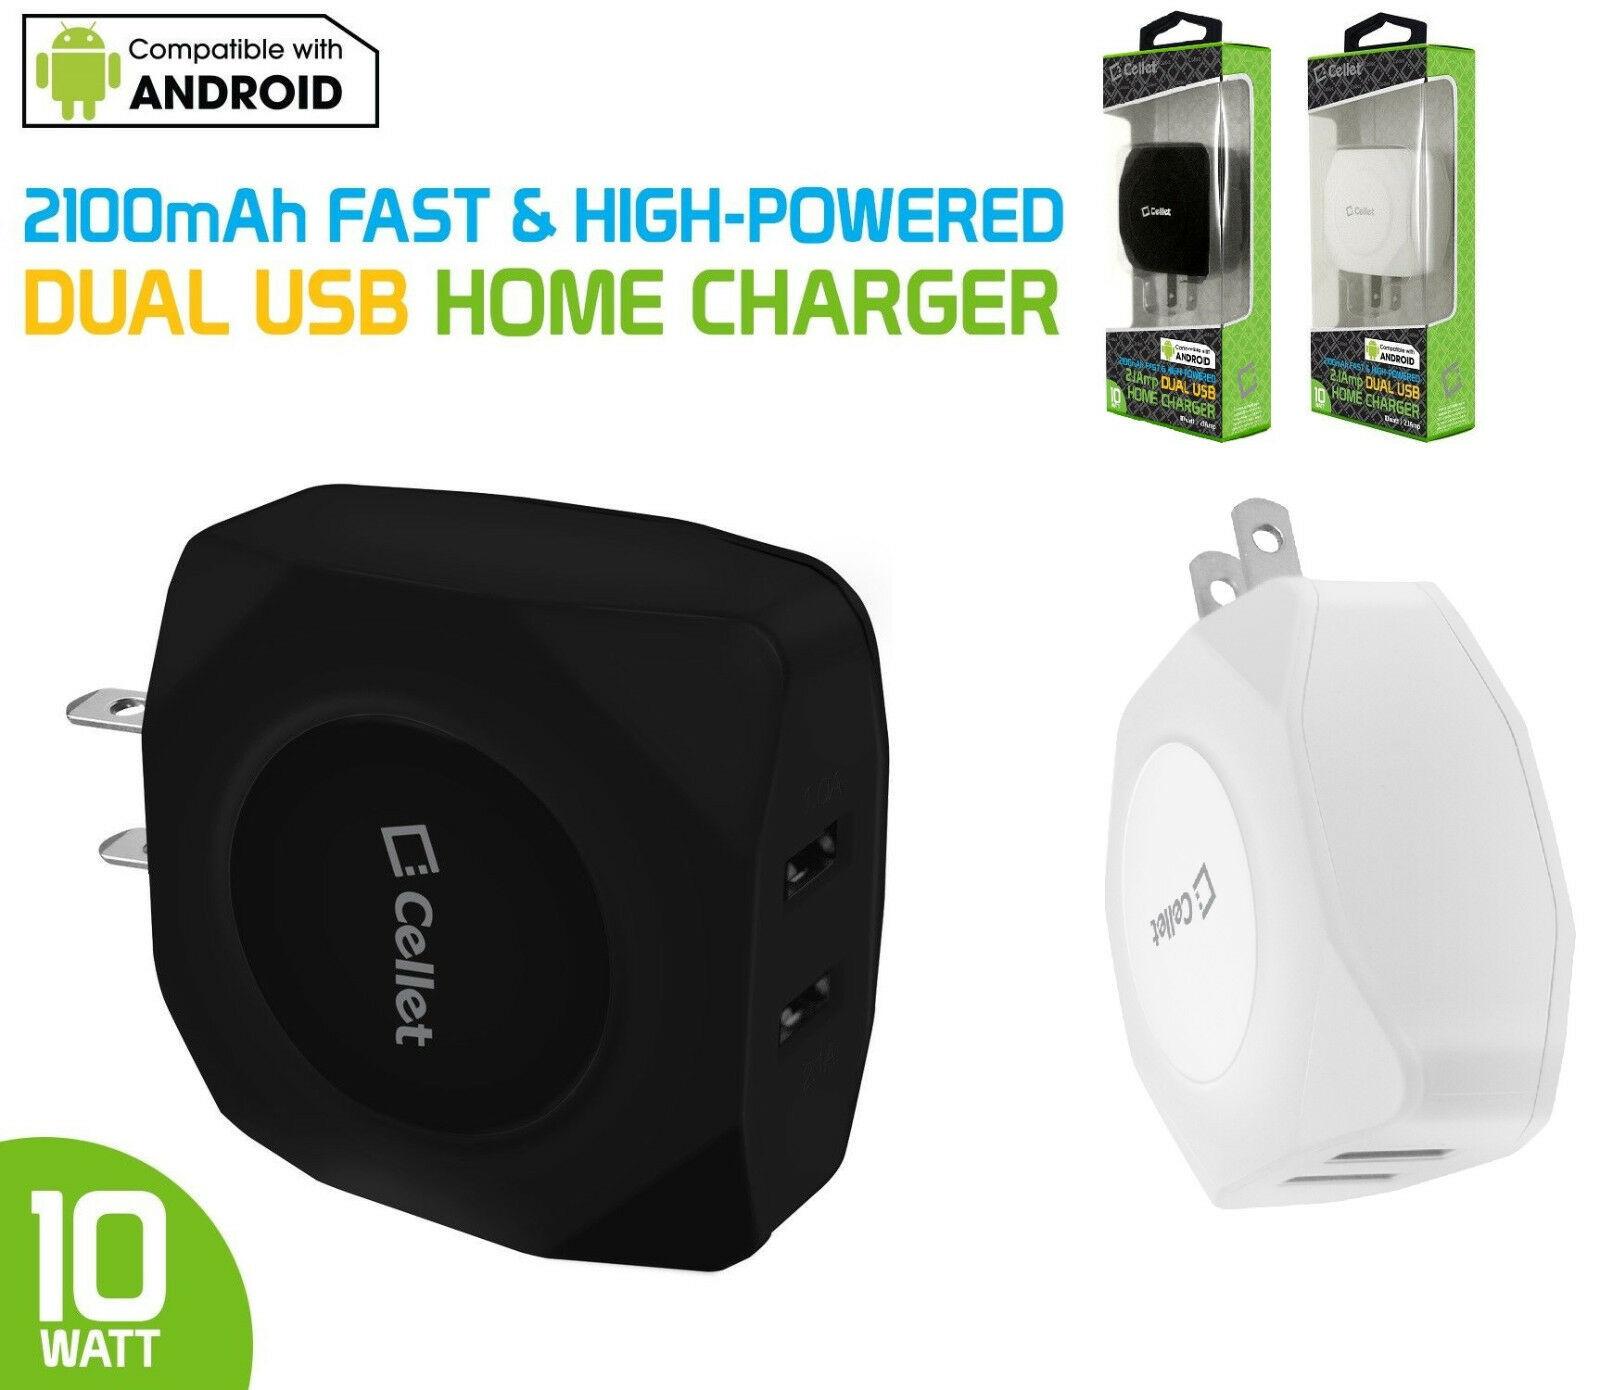 Cellet Universal 10 Watt / 2.1 Amp Dual USB Port Travel Home Wall Charger